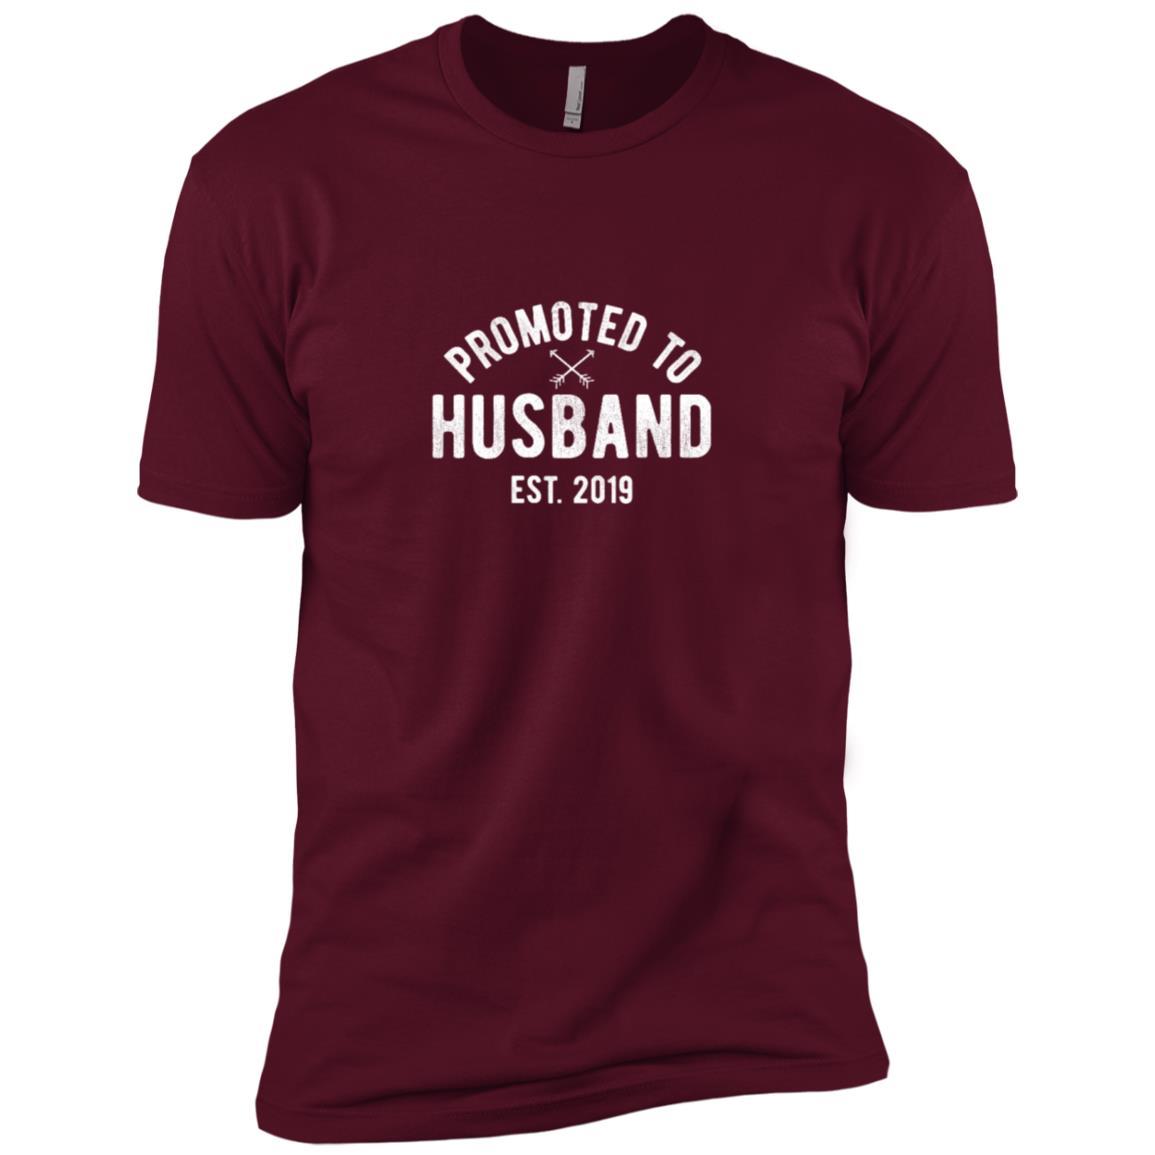 New Husband 2019 Getting Married Groom Gift Tee Men Short Sleeve T-Shirt